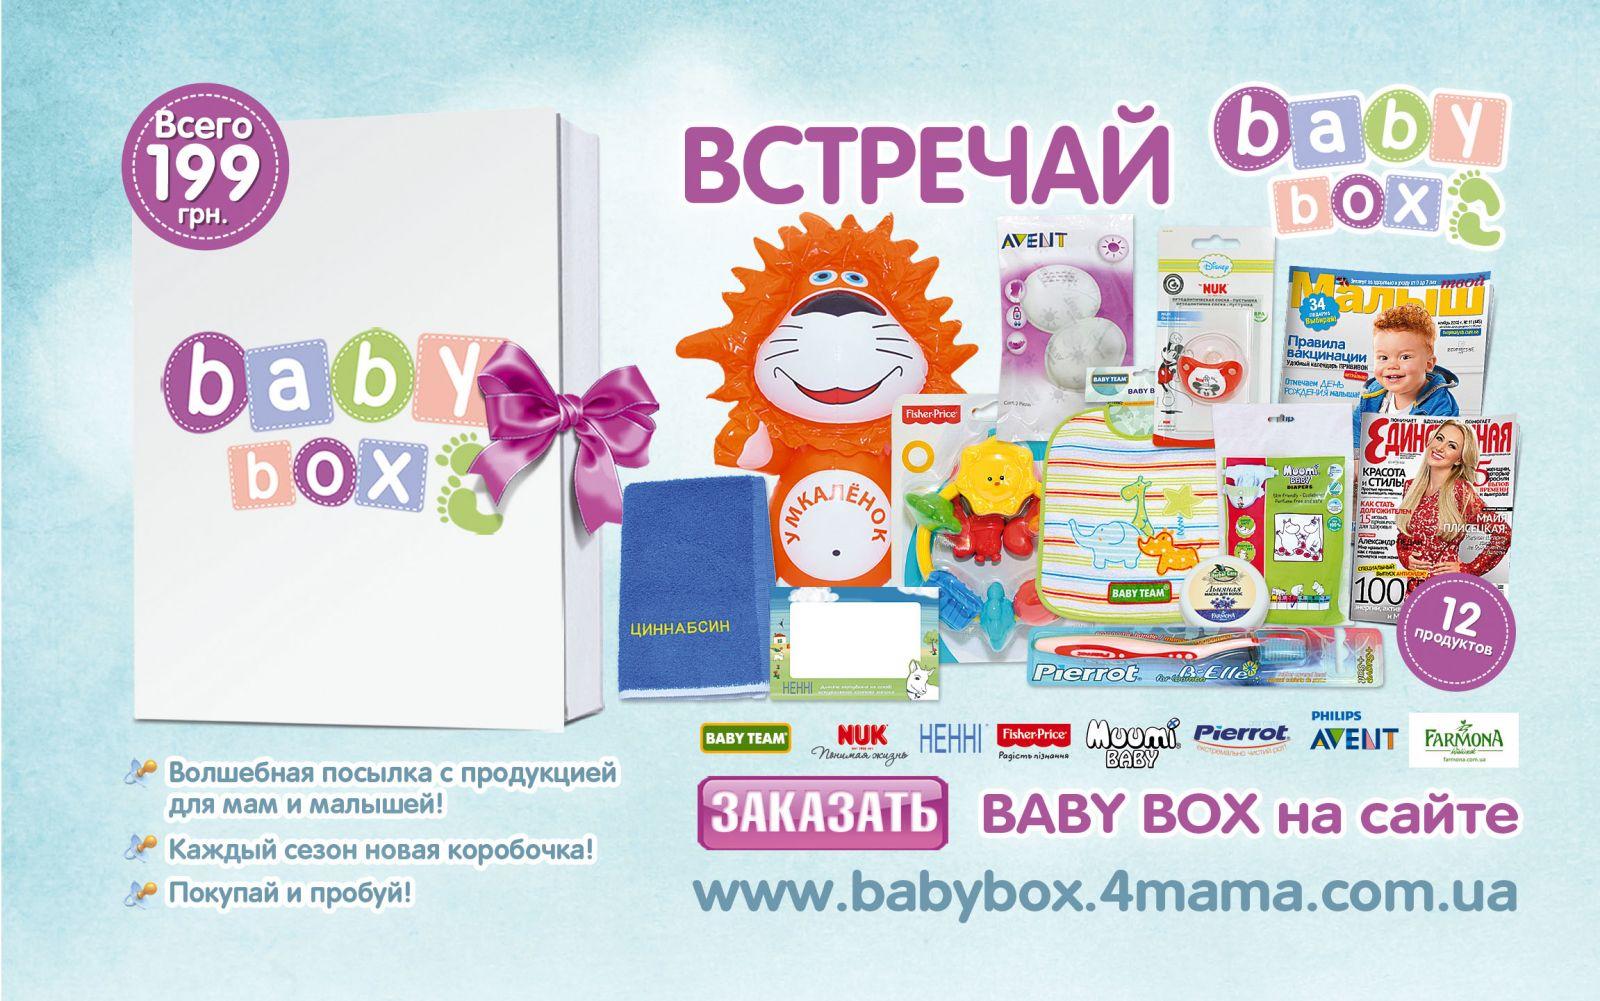 Baby Box новая коробочка